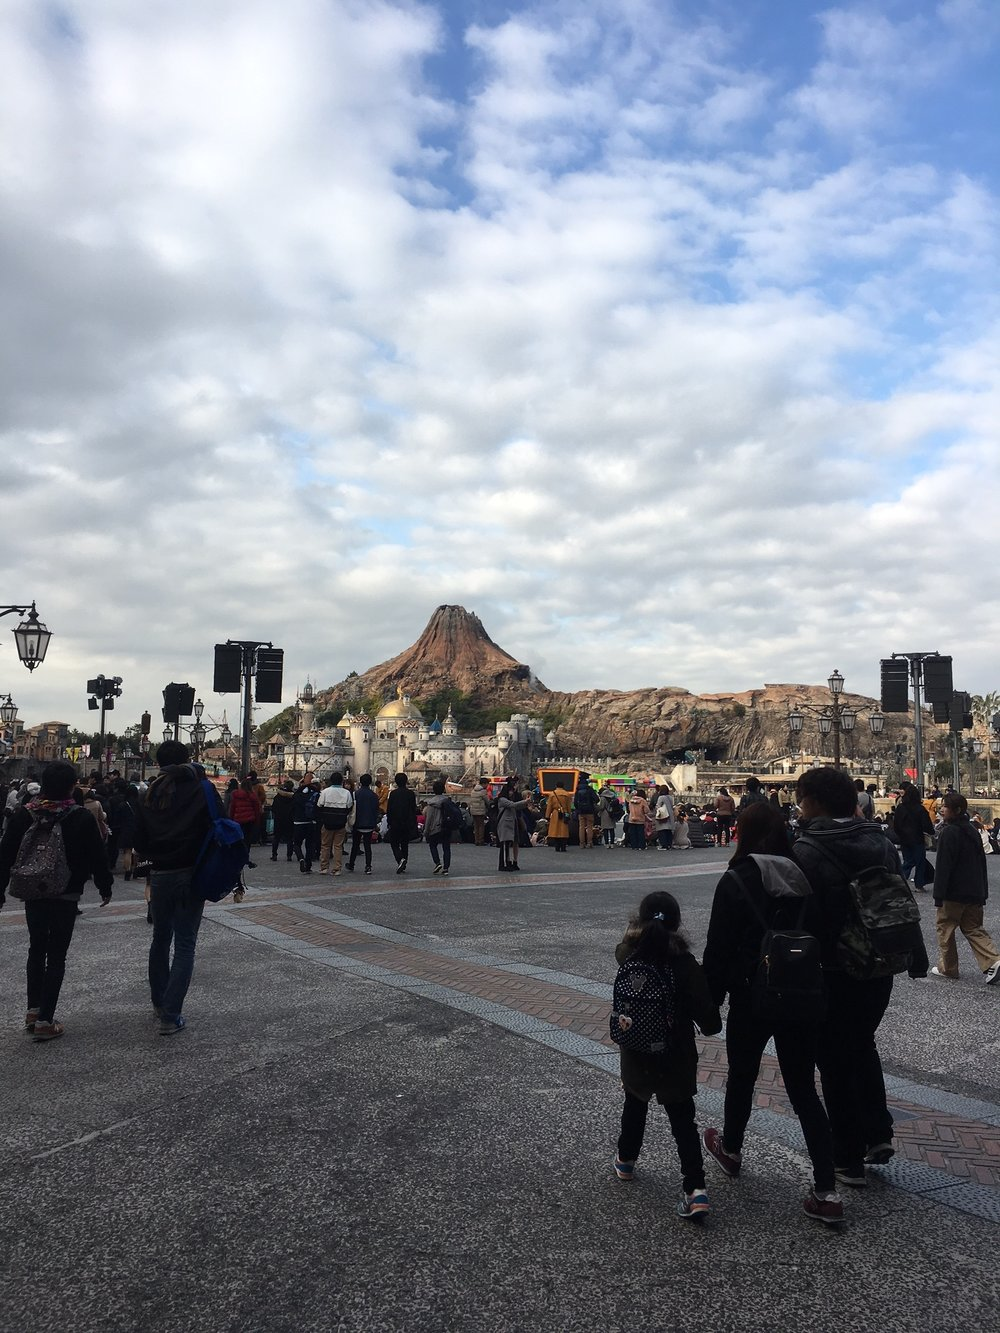 DisneySea-Schuyler-Croy-Volcano.JPG